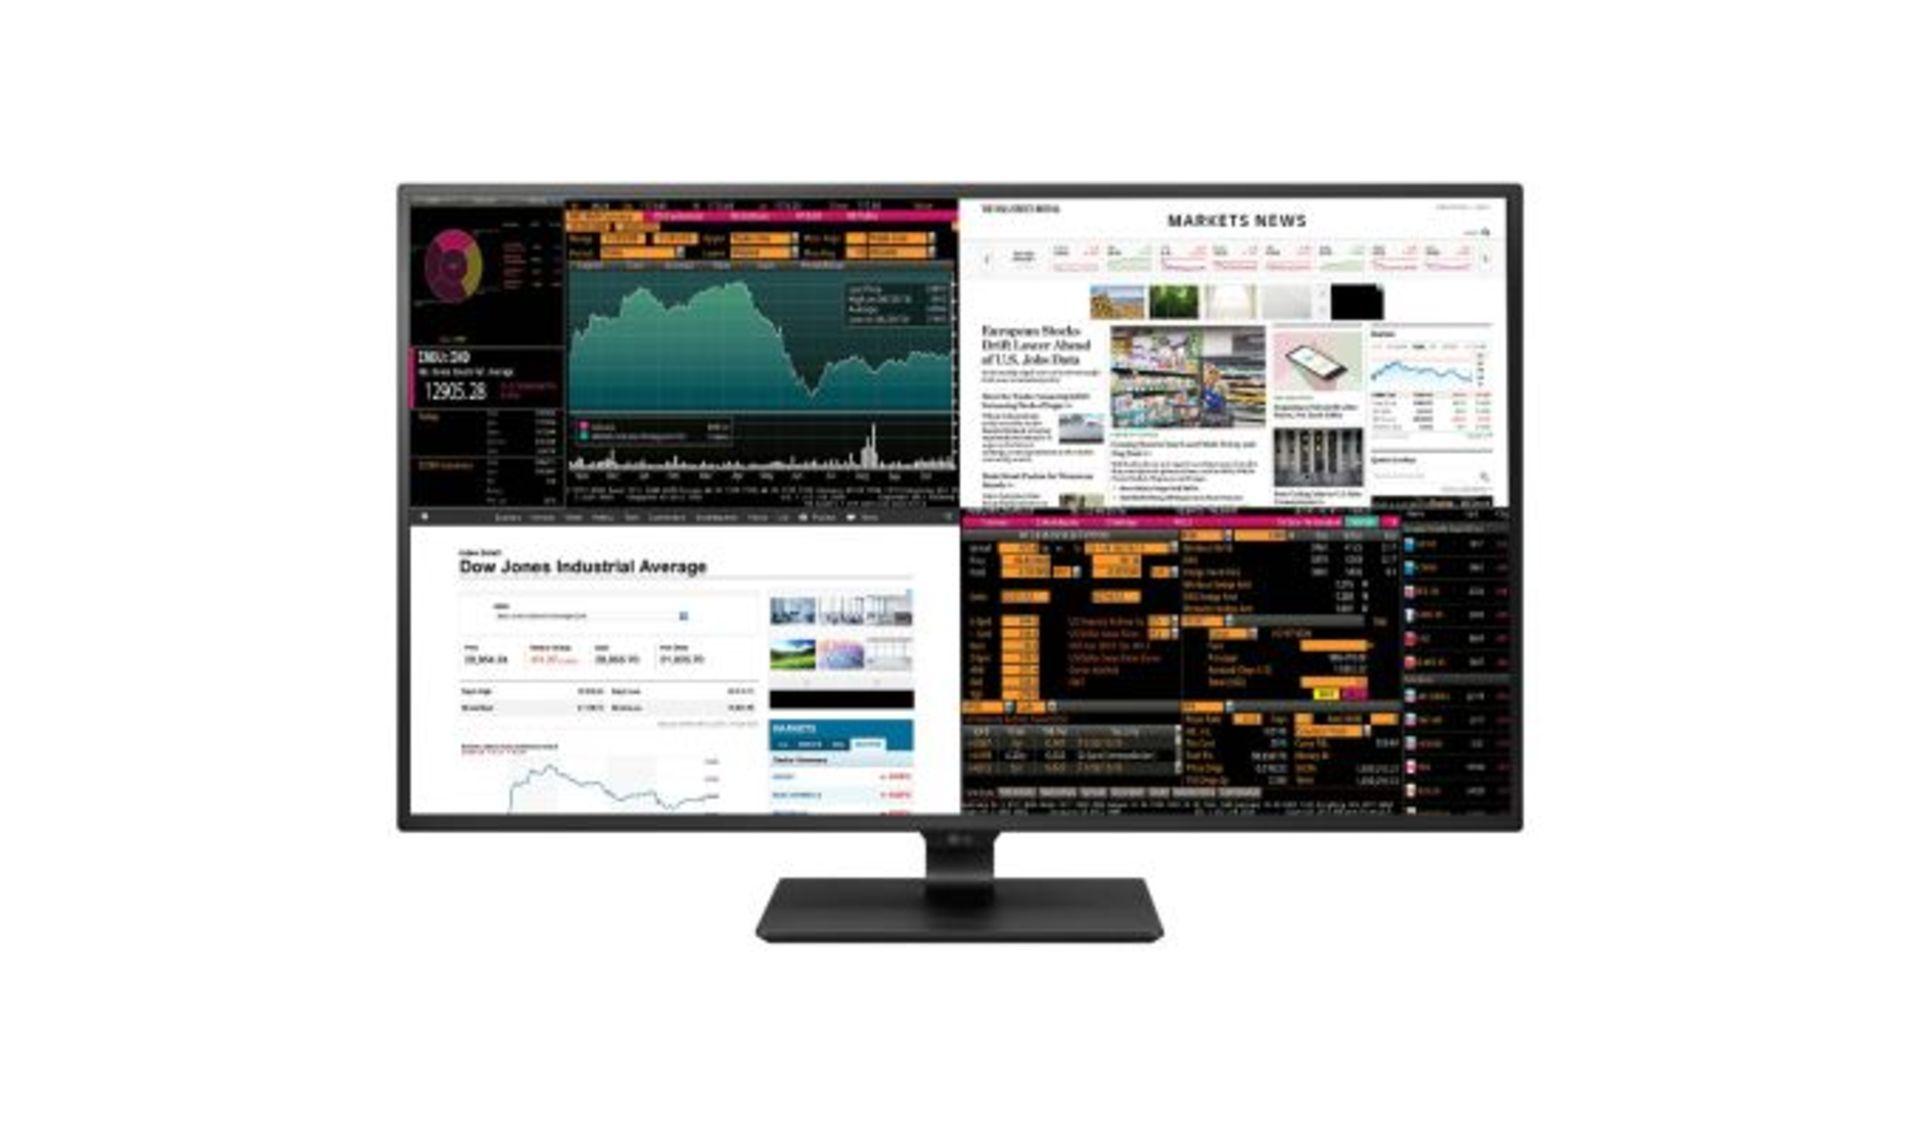 Lot 16023 - V Grade A LG 43 Inch 4K ULTRA HD IPS LED MONITOR - HDMI, DISPLAY PORT, USB TYPE C - SPEAKERS